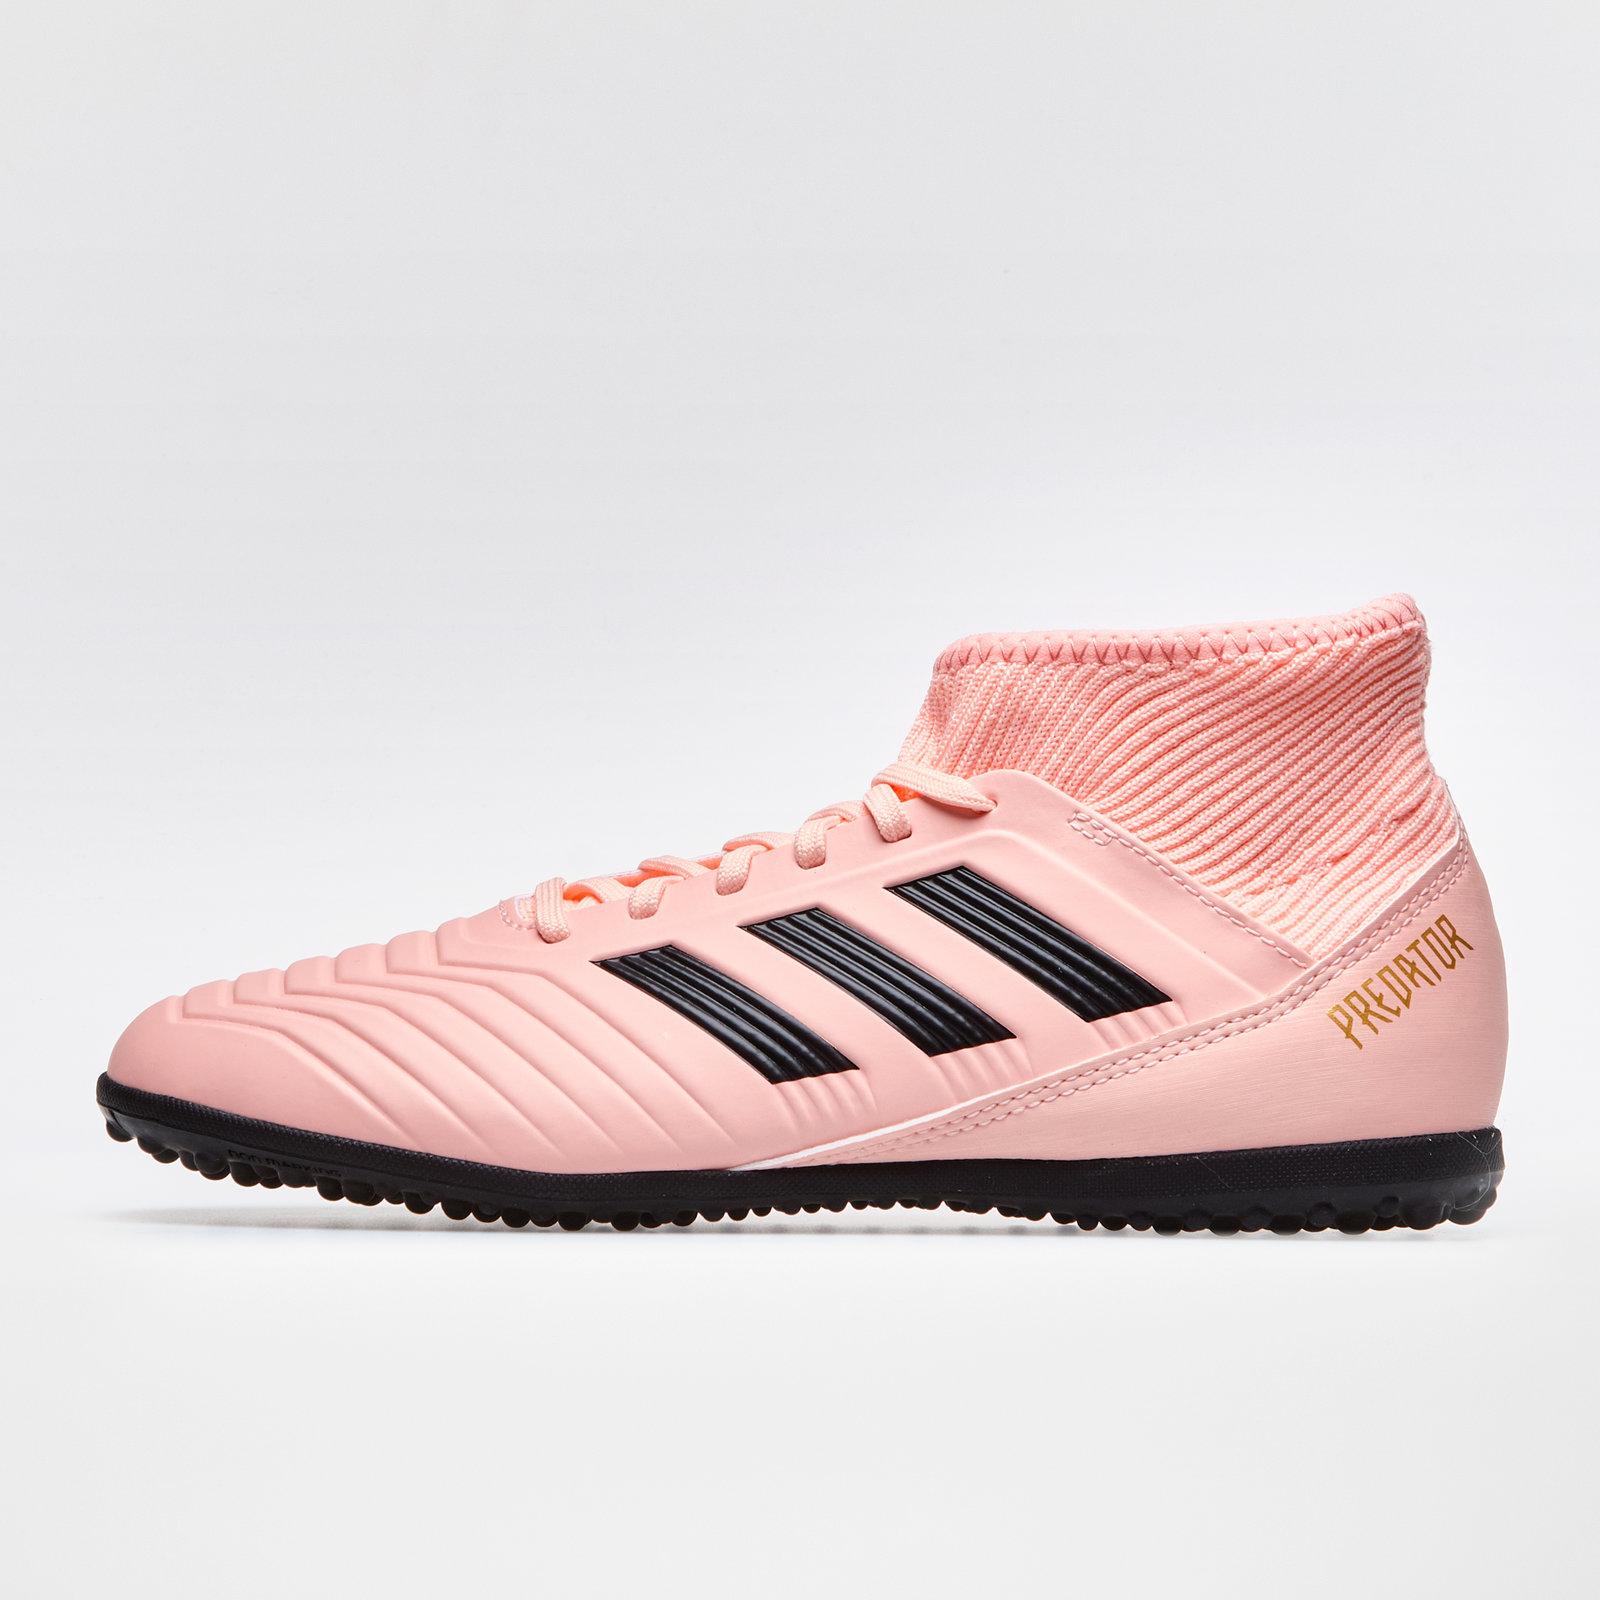 e0aba1056936f adidas Predator Tango 18.3 TF Kids Football Boots Studs Trainers Sports  Shoes